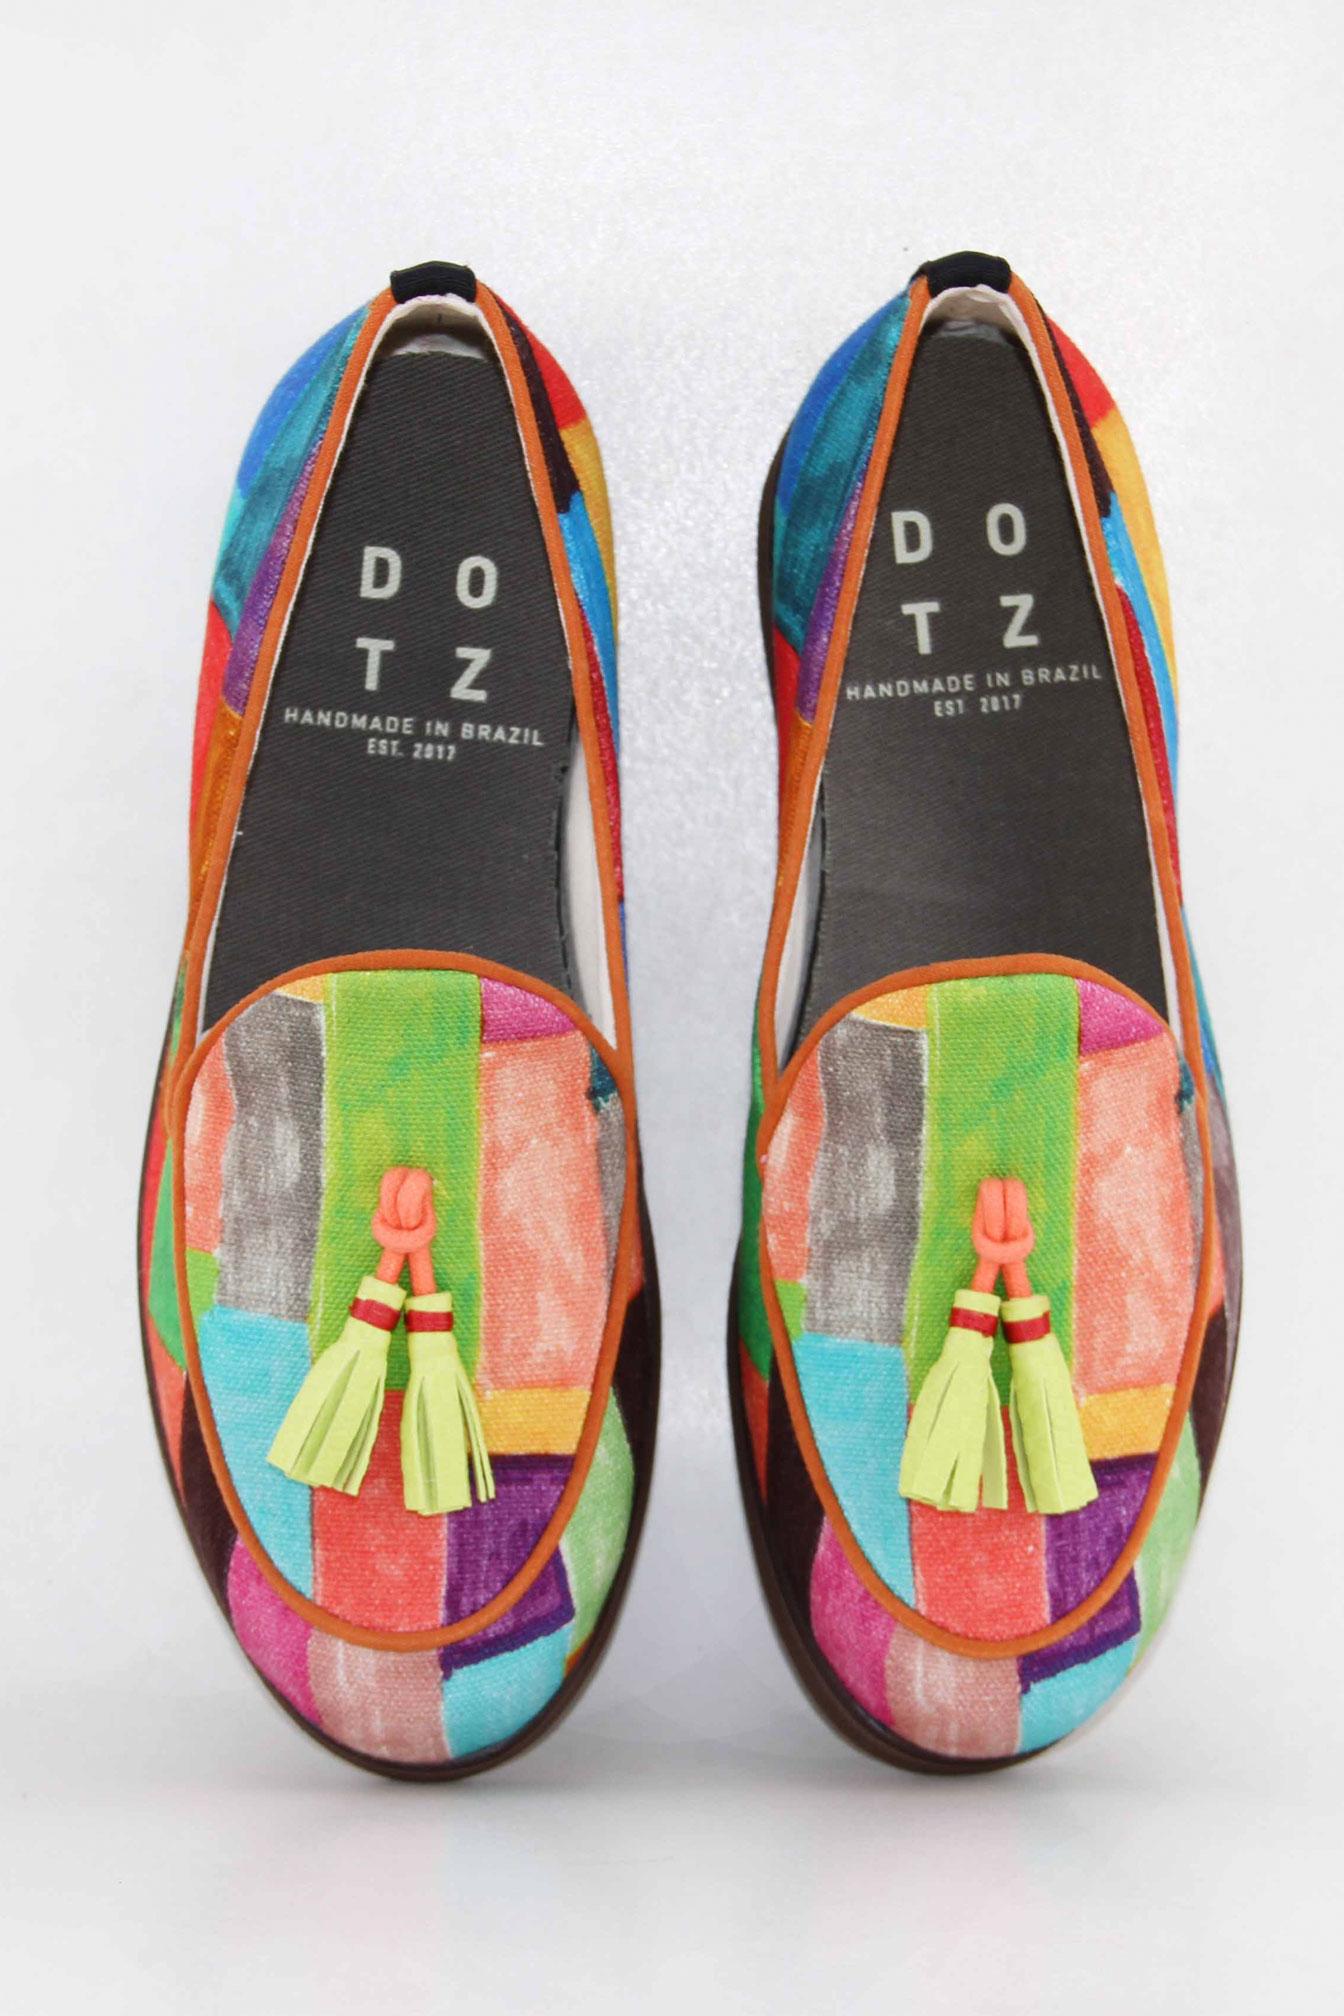 Dotz-scarpe-donna-rettangoli-fronte